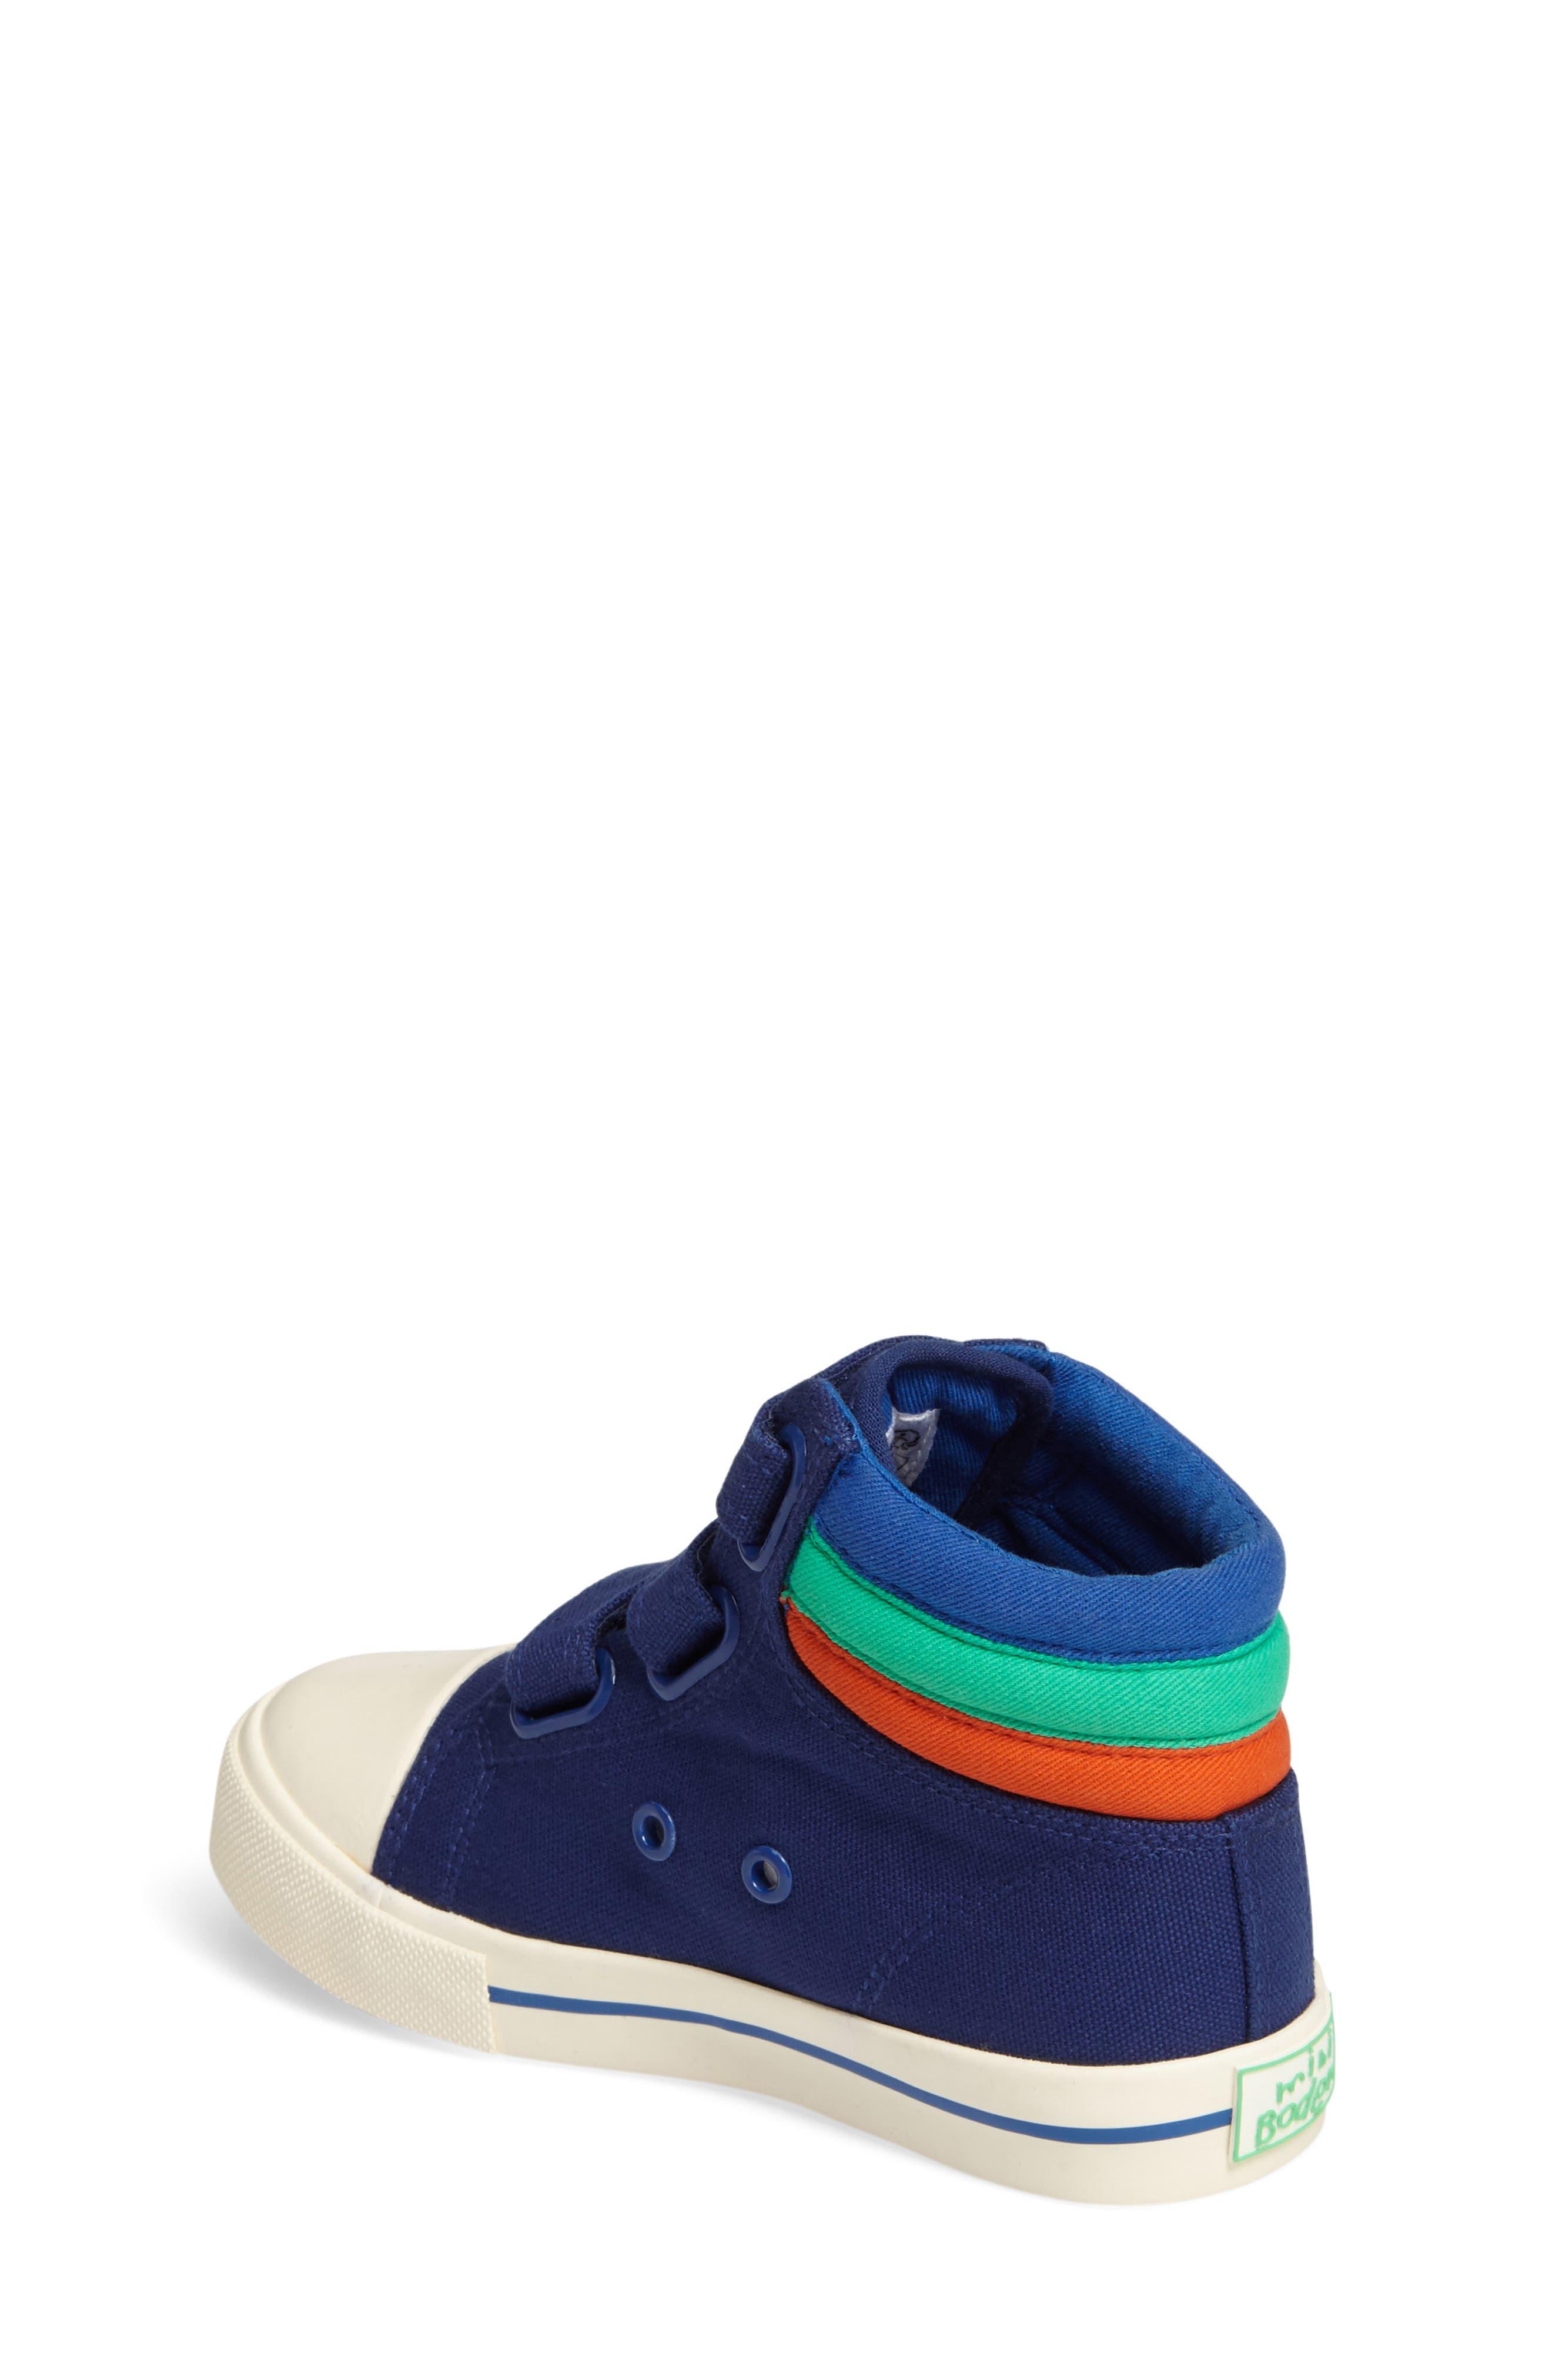 Alternate Image 2  - Mini Boden High Top Sneaker (Toddler, Little Kid & Big Kid)